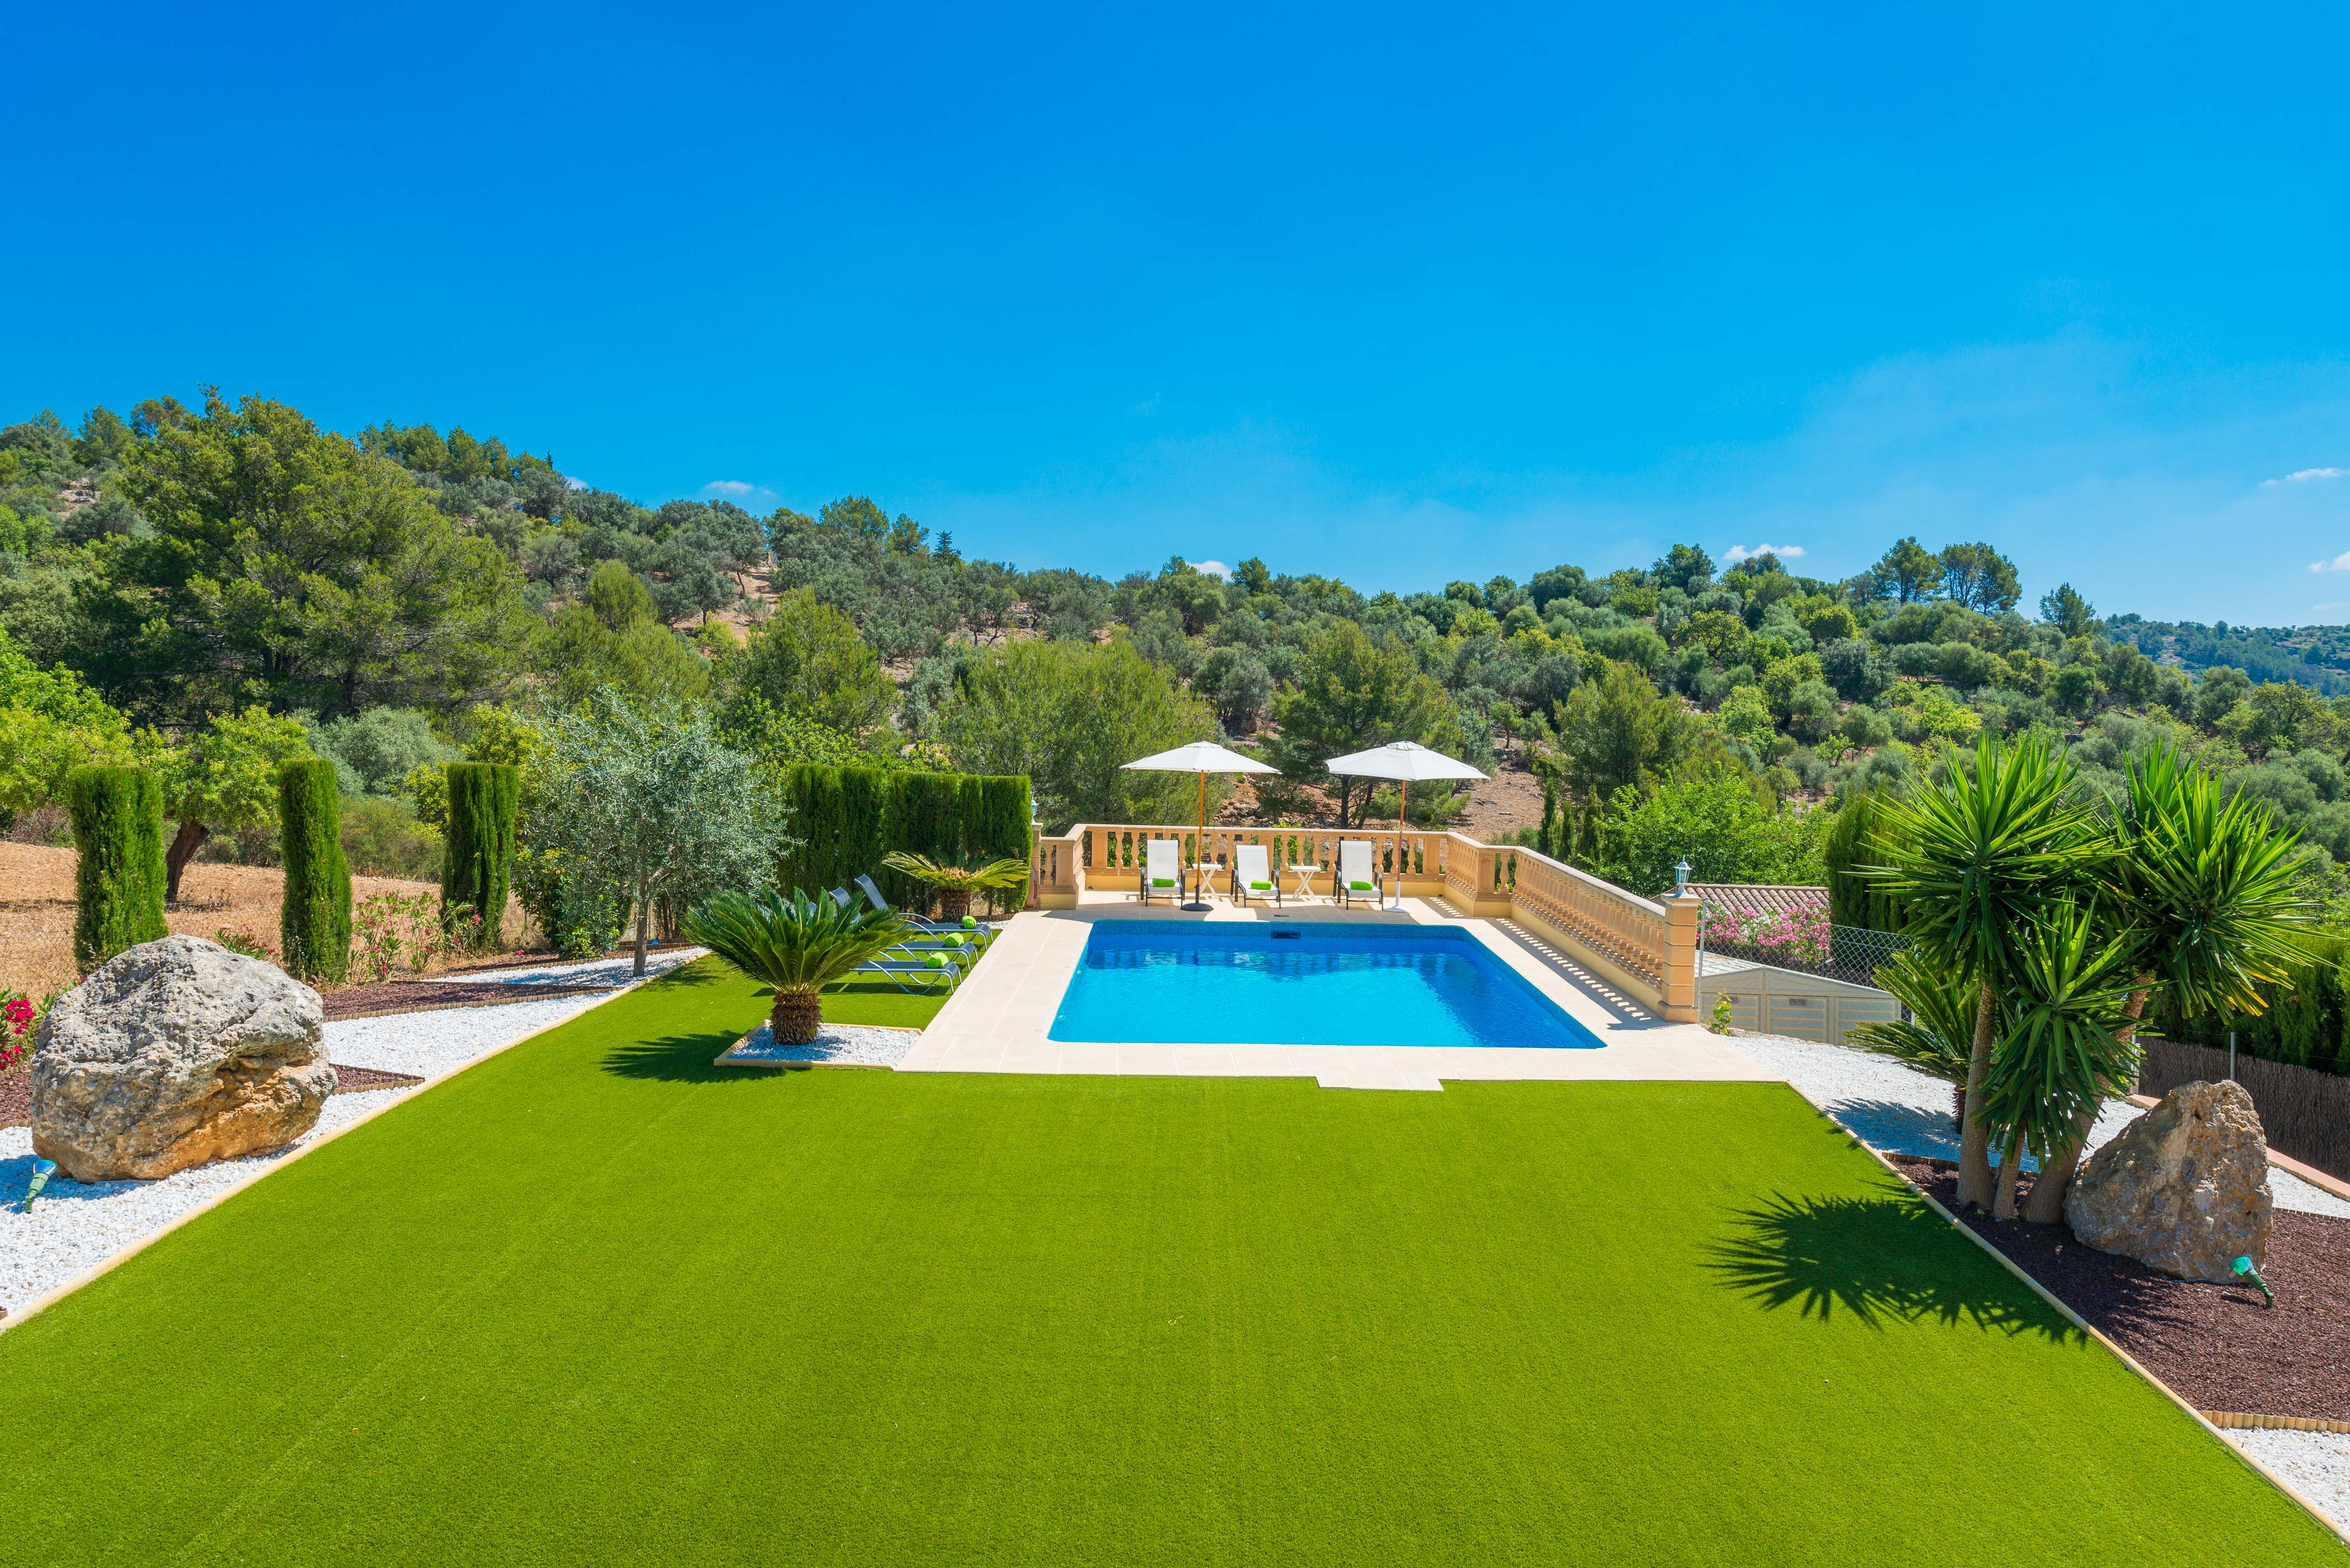 Ferienhaus SA TANCA (MANCORINA) (2037553), Mancor de la Vall, Mallorca, Balearische Inseln, Spanien, Bild 7